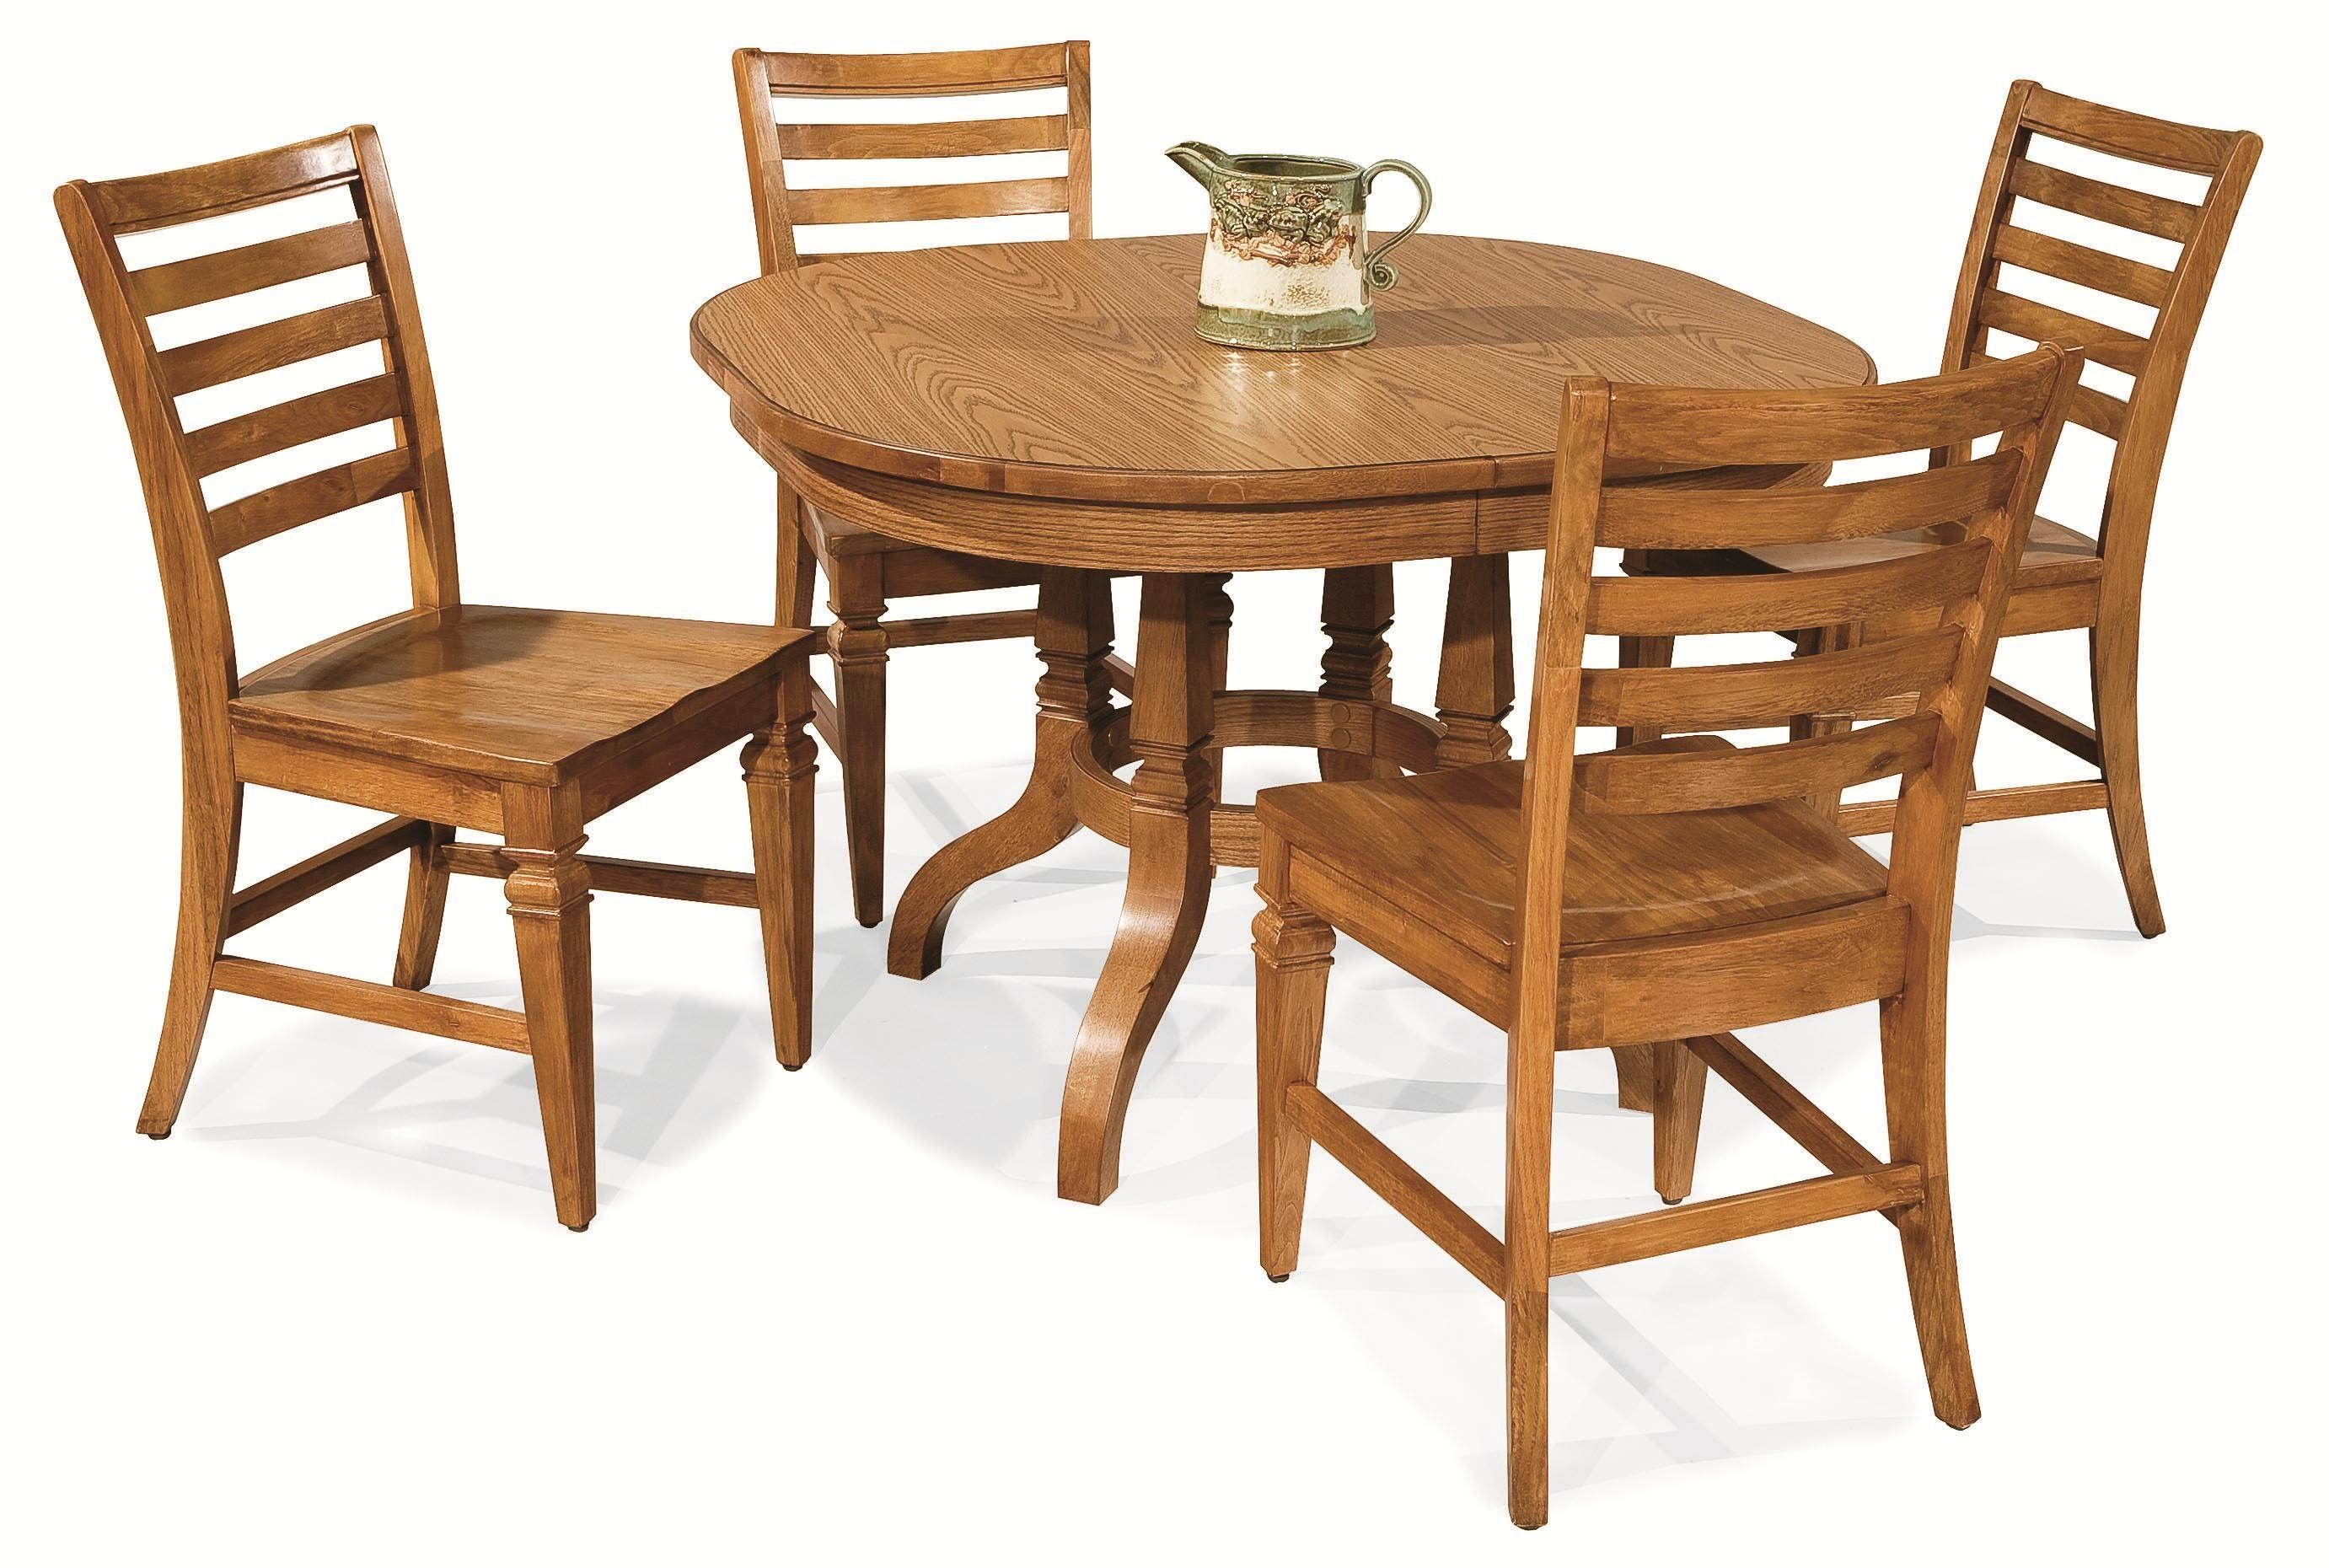 Dura Dine 5 Piece Laminate Top Pedestal Table Set By Chromcraft Barrow Fine Furniture Dining Mobile Dothan Alabama Pensacola Florida